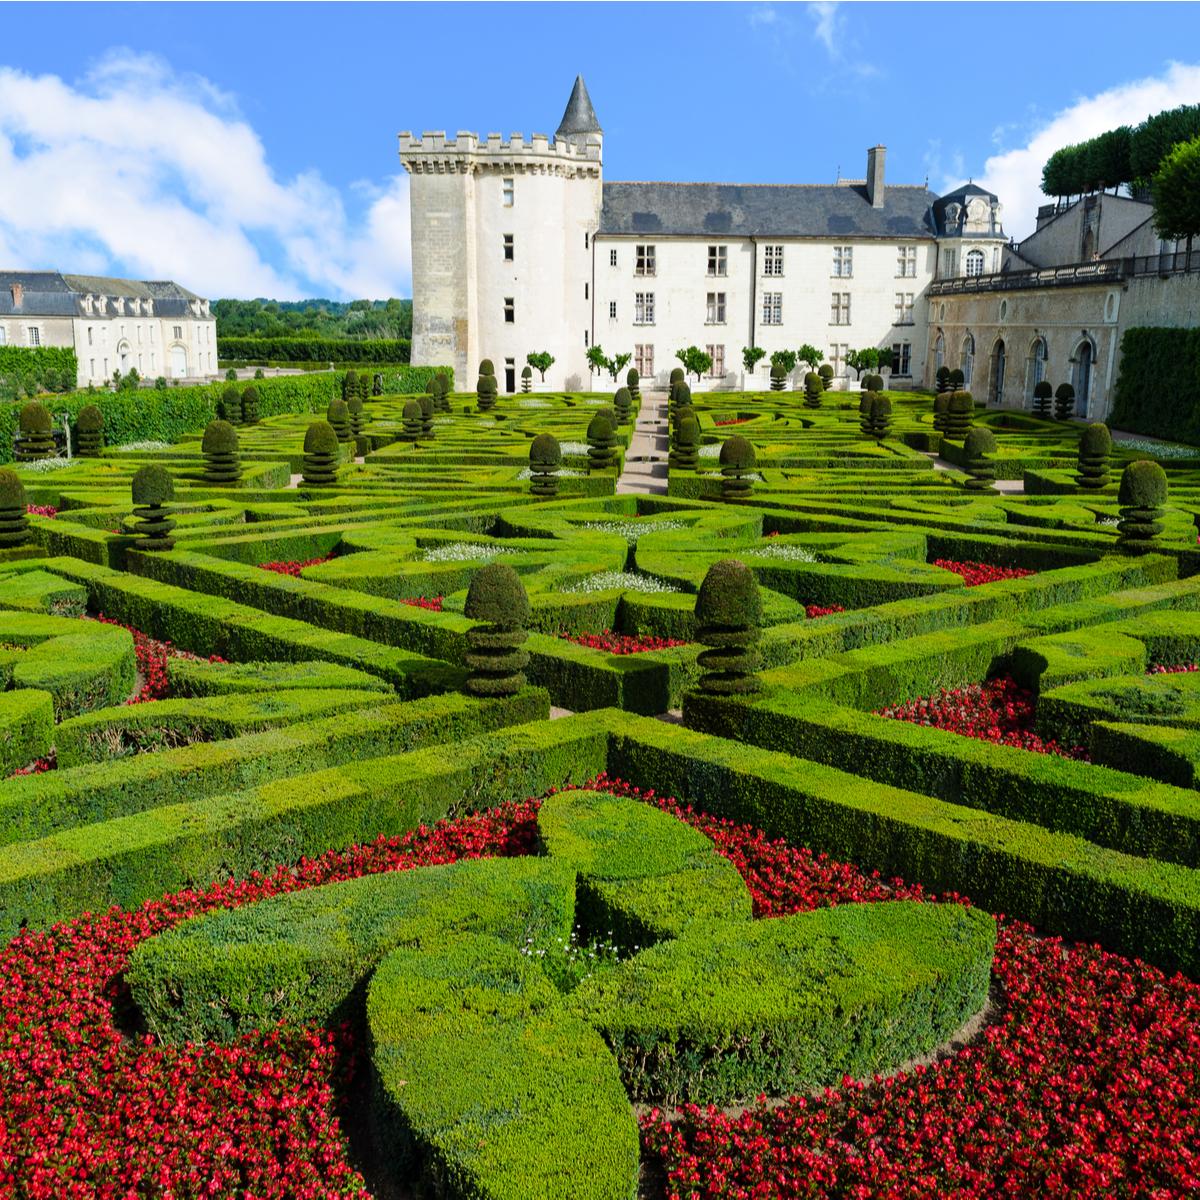 Gardens of the Castle of Villandry